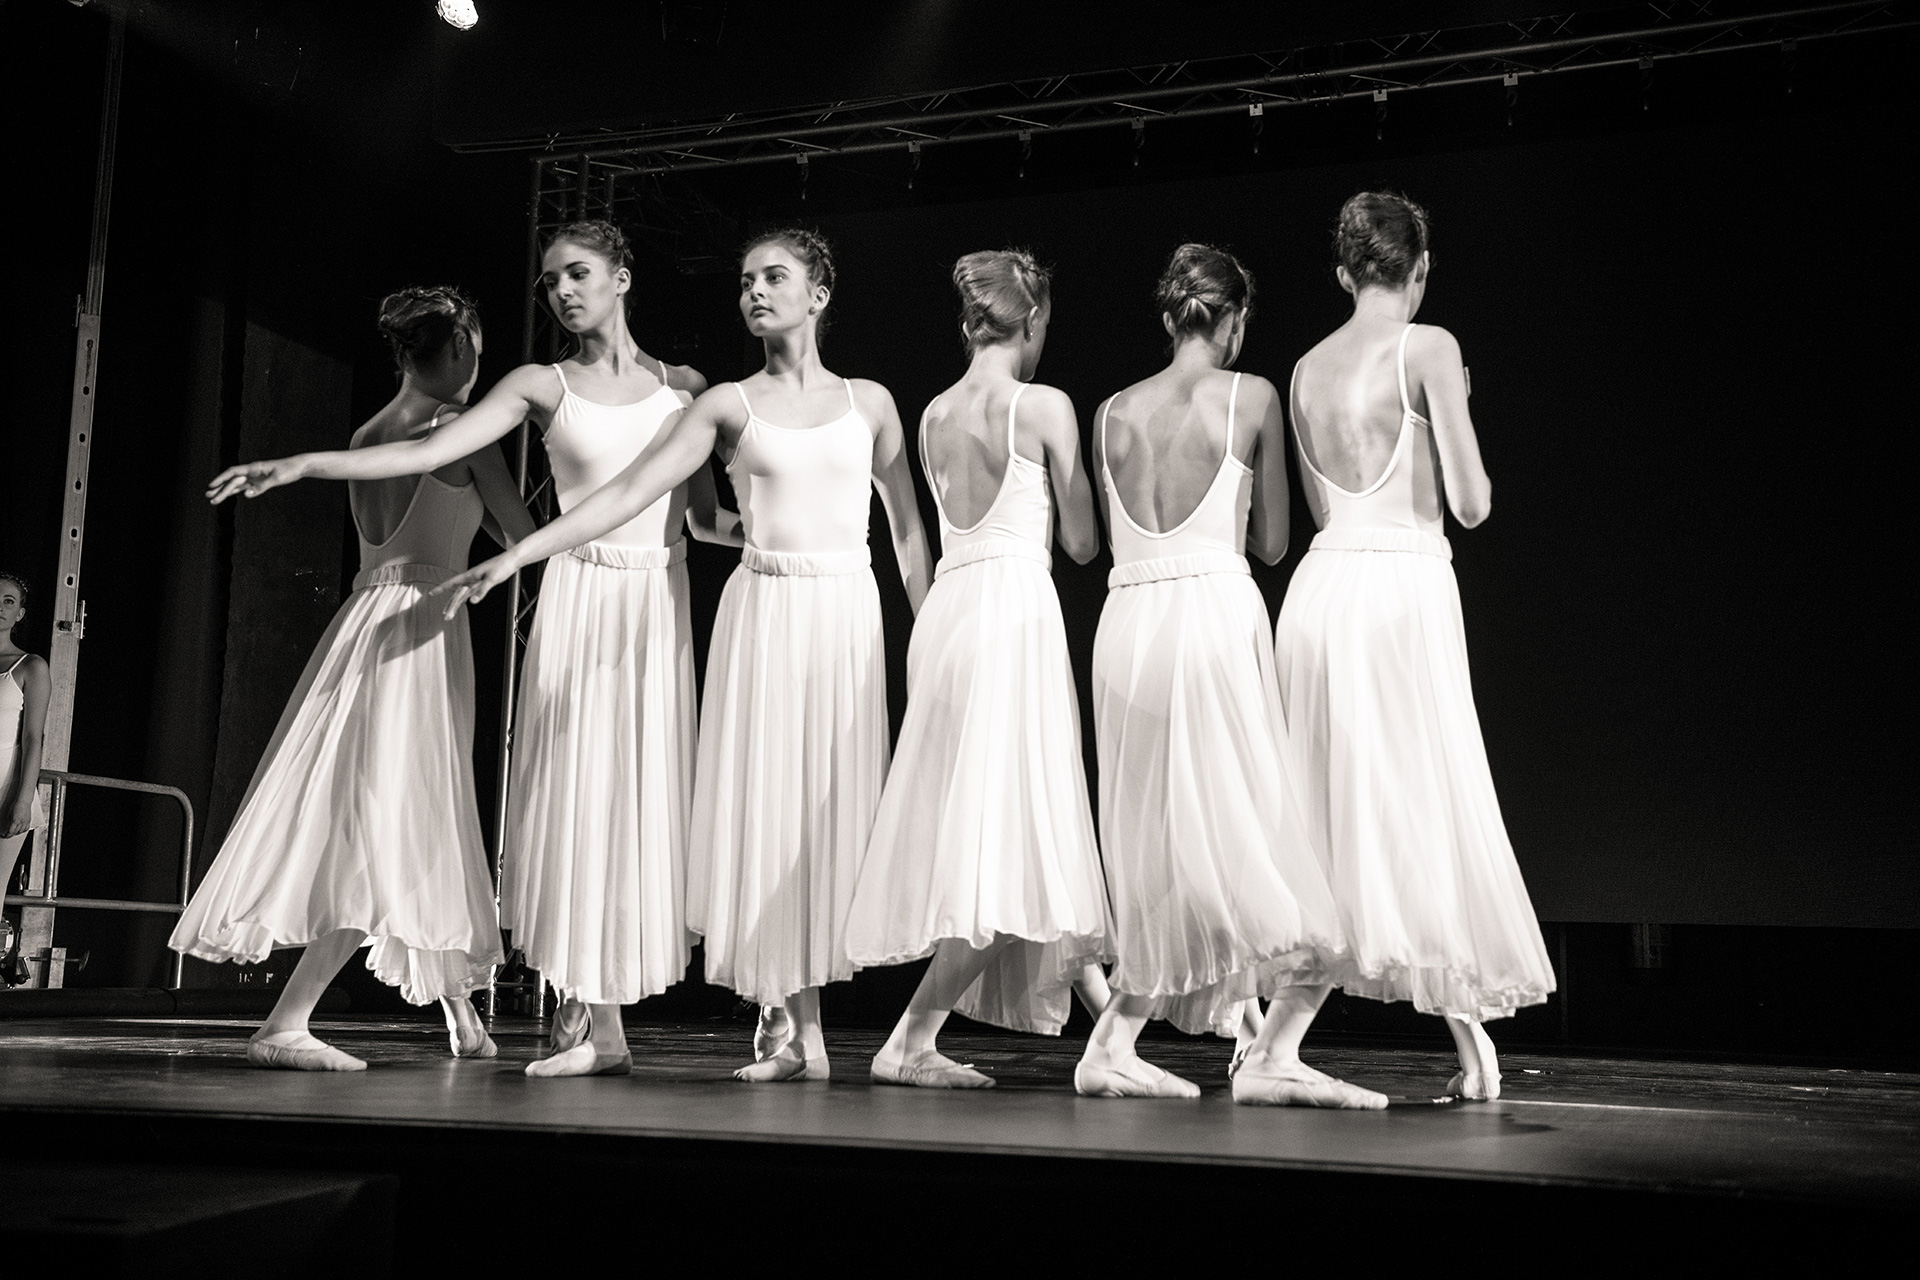 Ballett-by-SilvanGiger-67.jpg